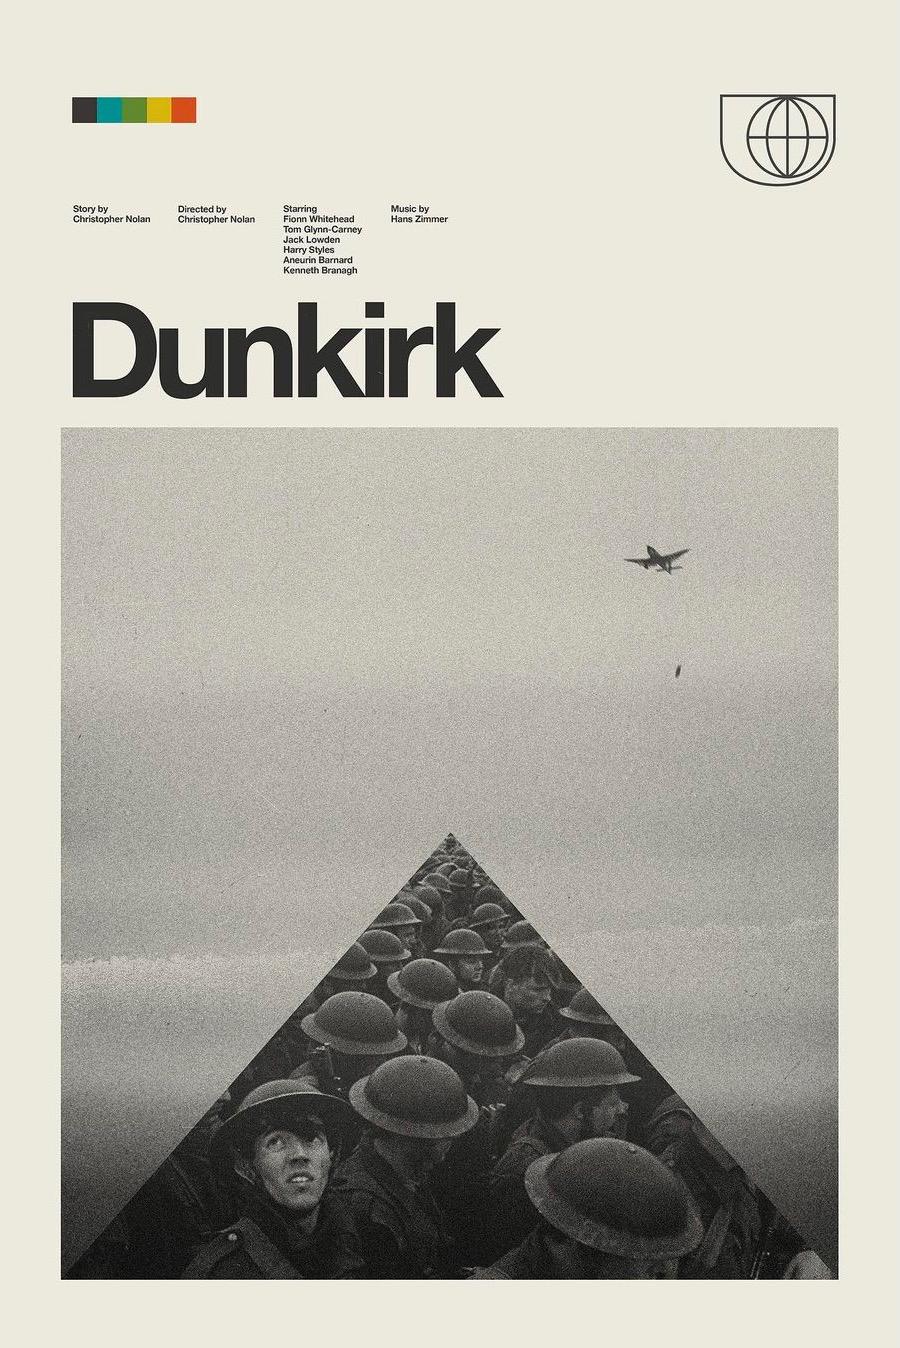 retro modern movie poster for Dunkirk